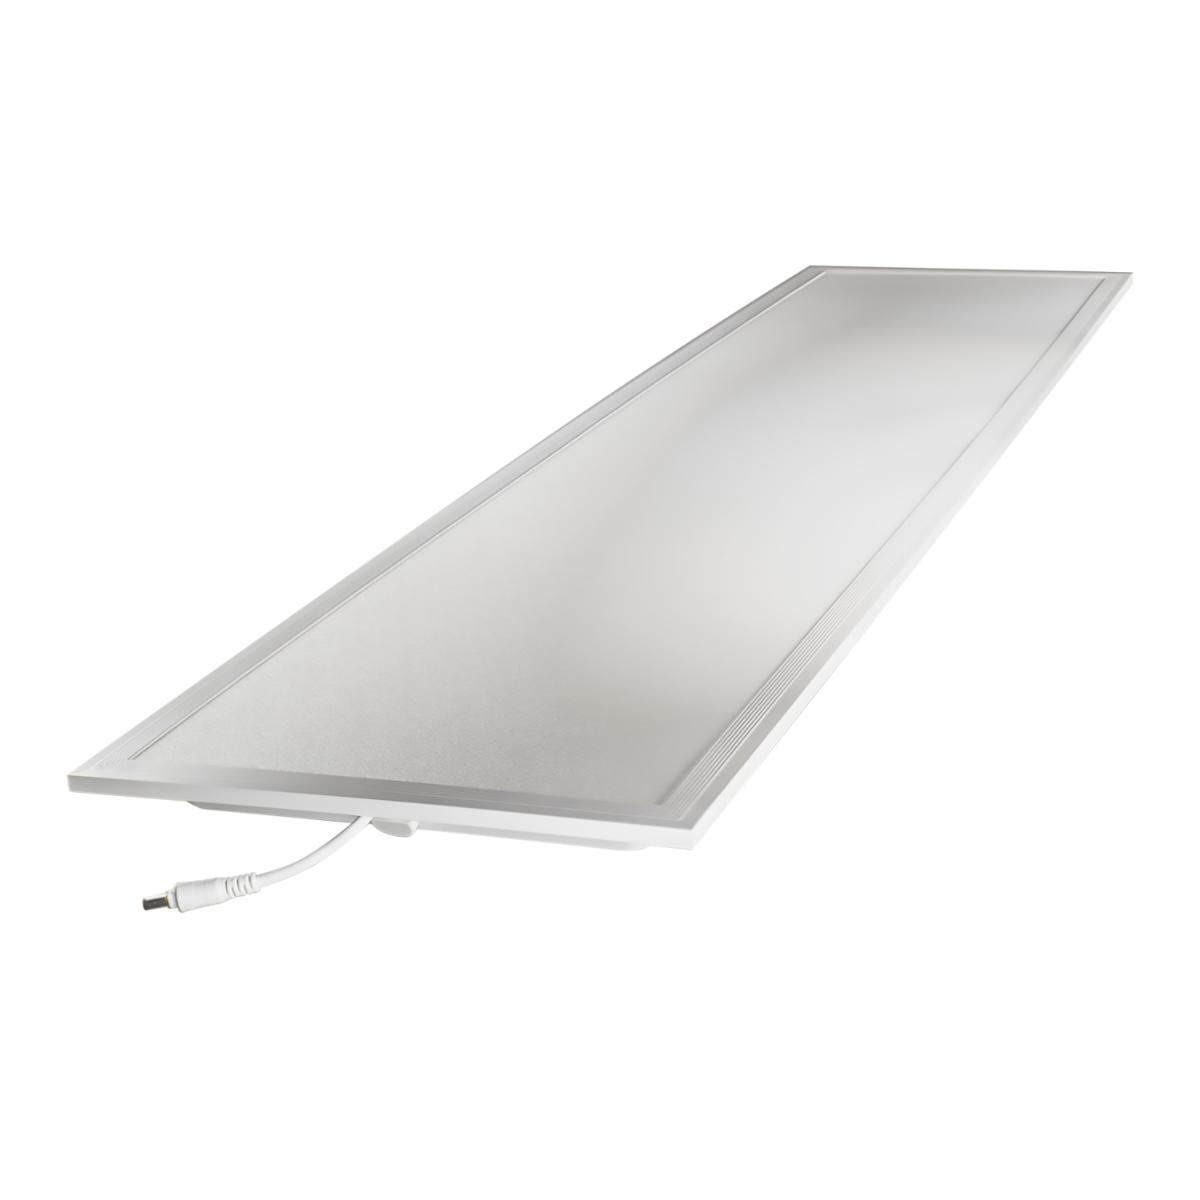 Noxion LED Panel Delta Pro Highlum V2.0 Xitanium DALI 40W 30x120cm 3000K 5280lm UGR <19 | Dali Dimmable - Warm White - Replaces 2x36W